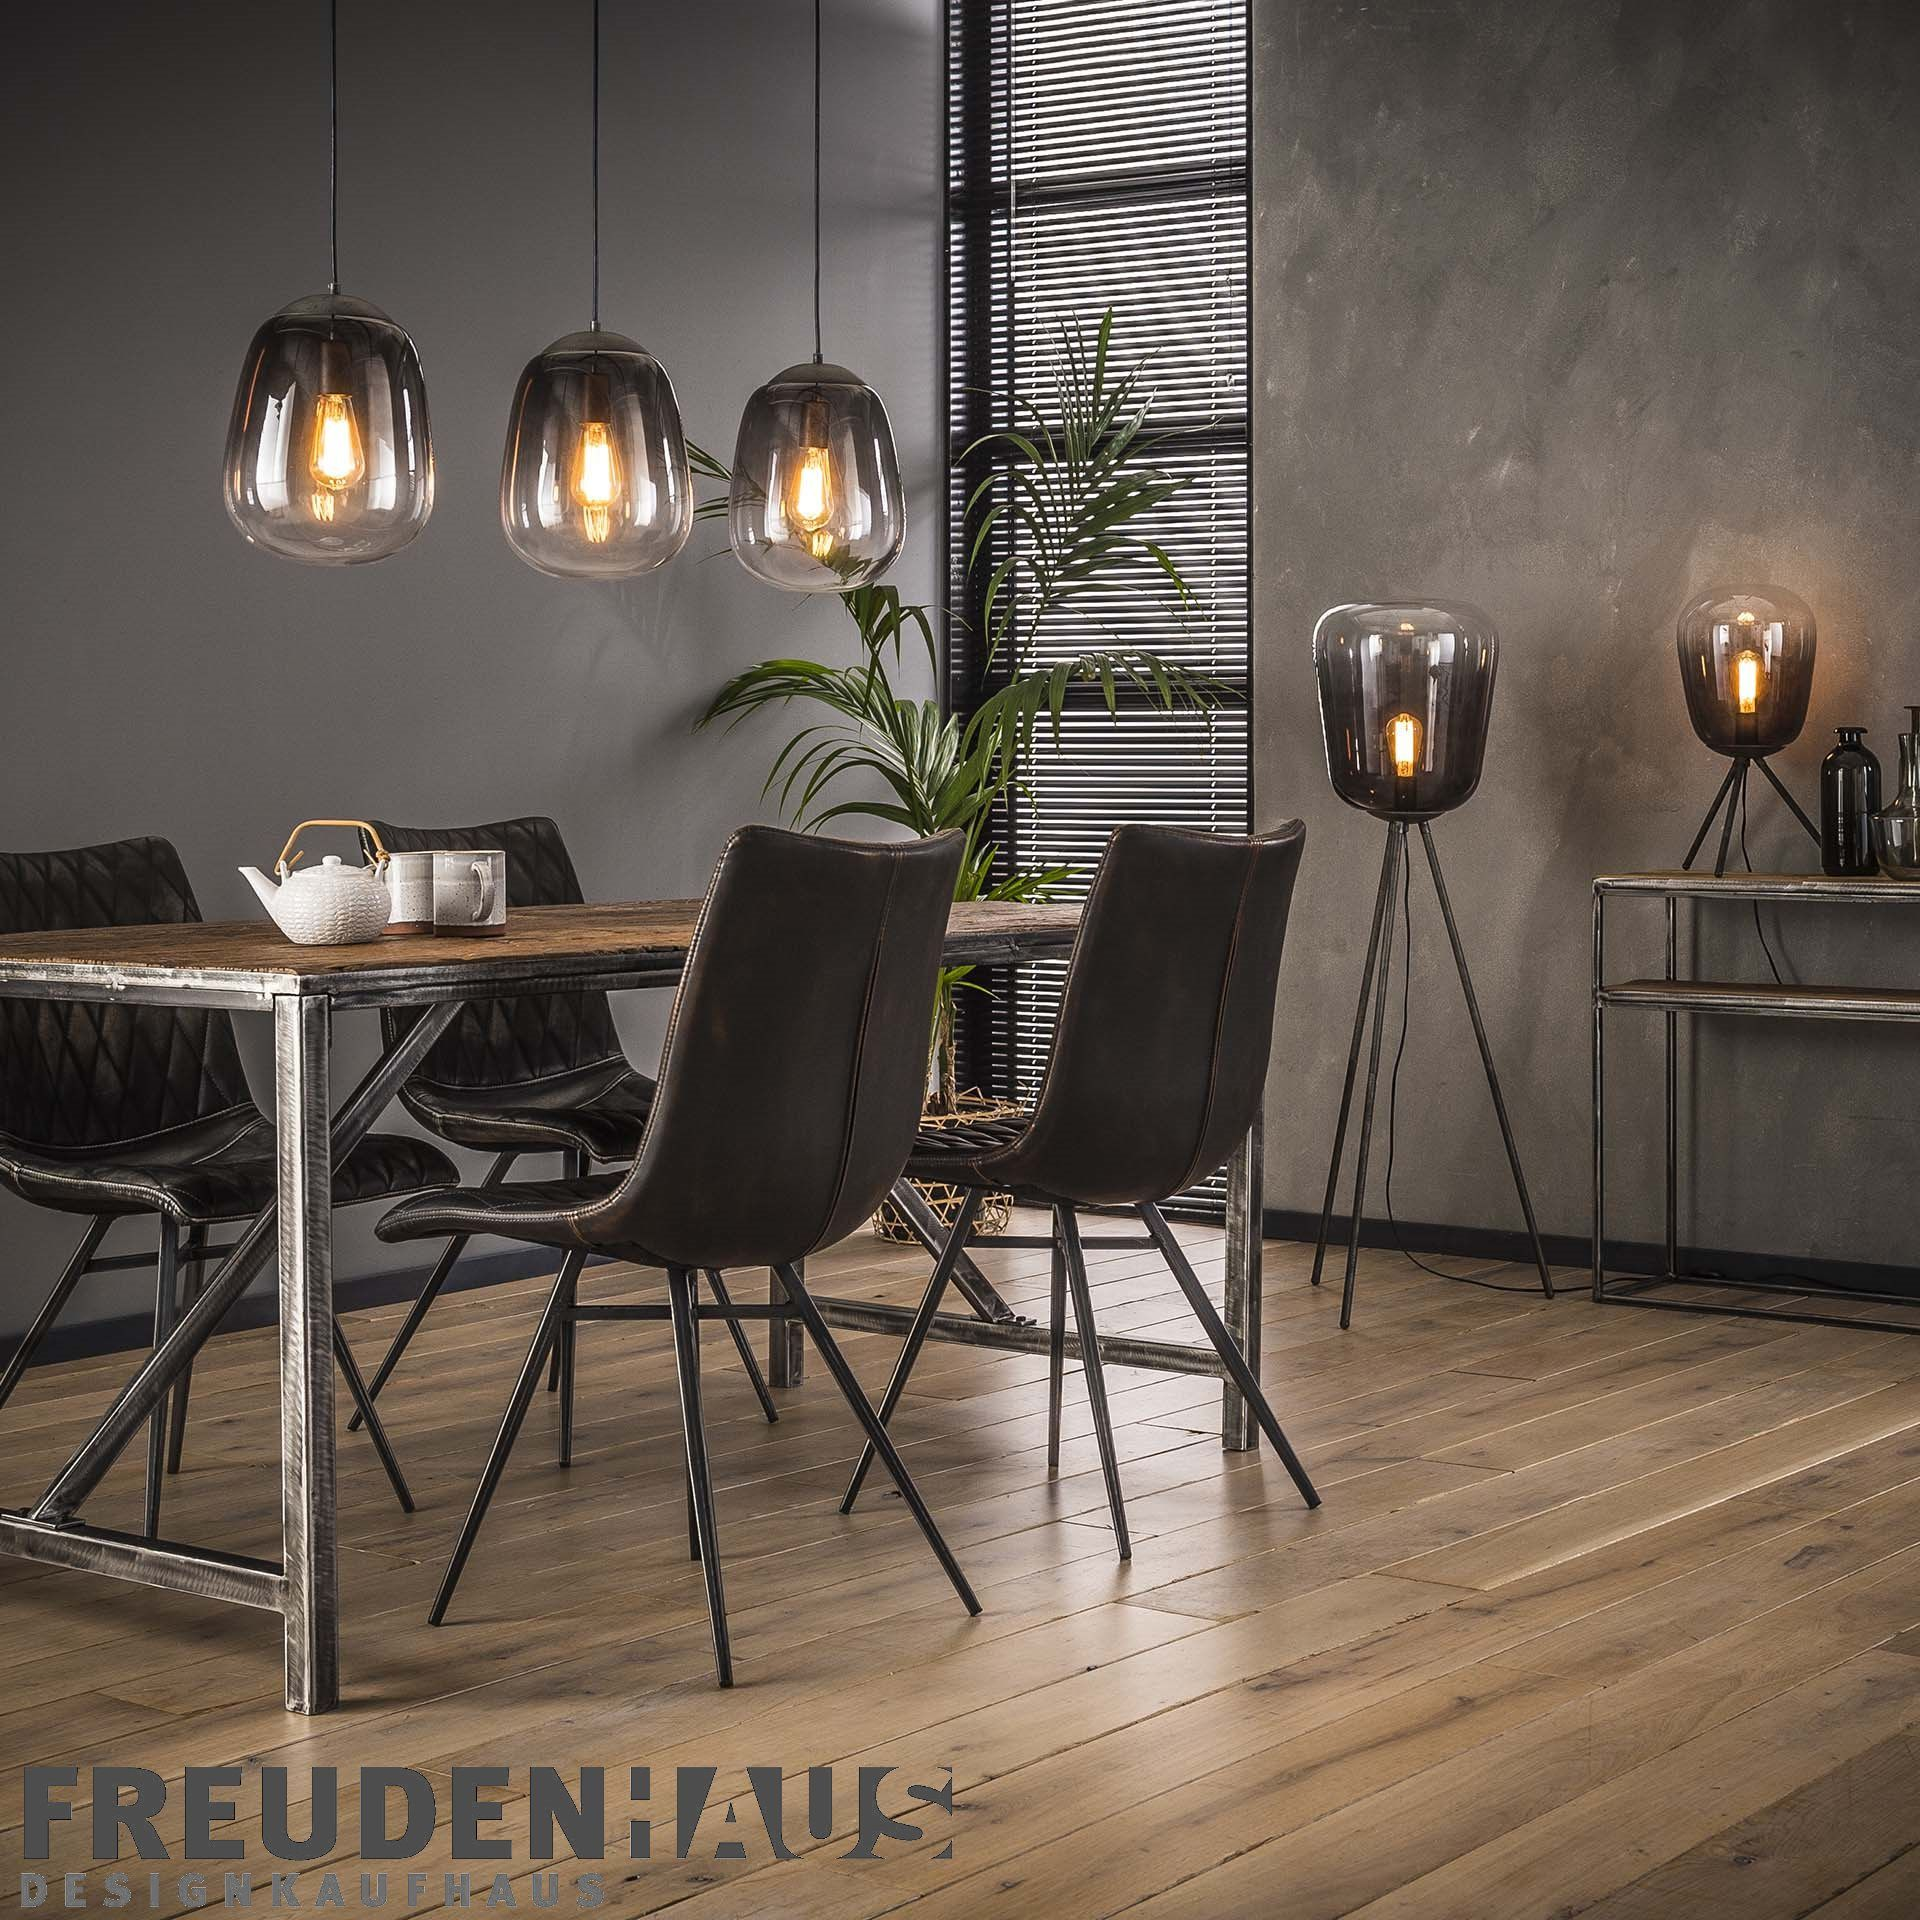 Stehlampe Shaded Bulb Industrial Getontes Rauchglas Lampen